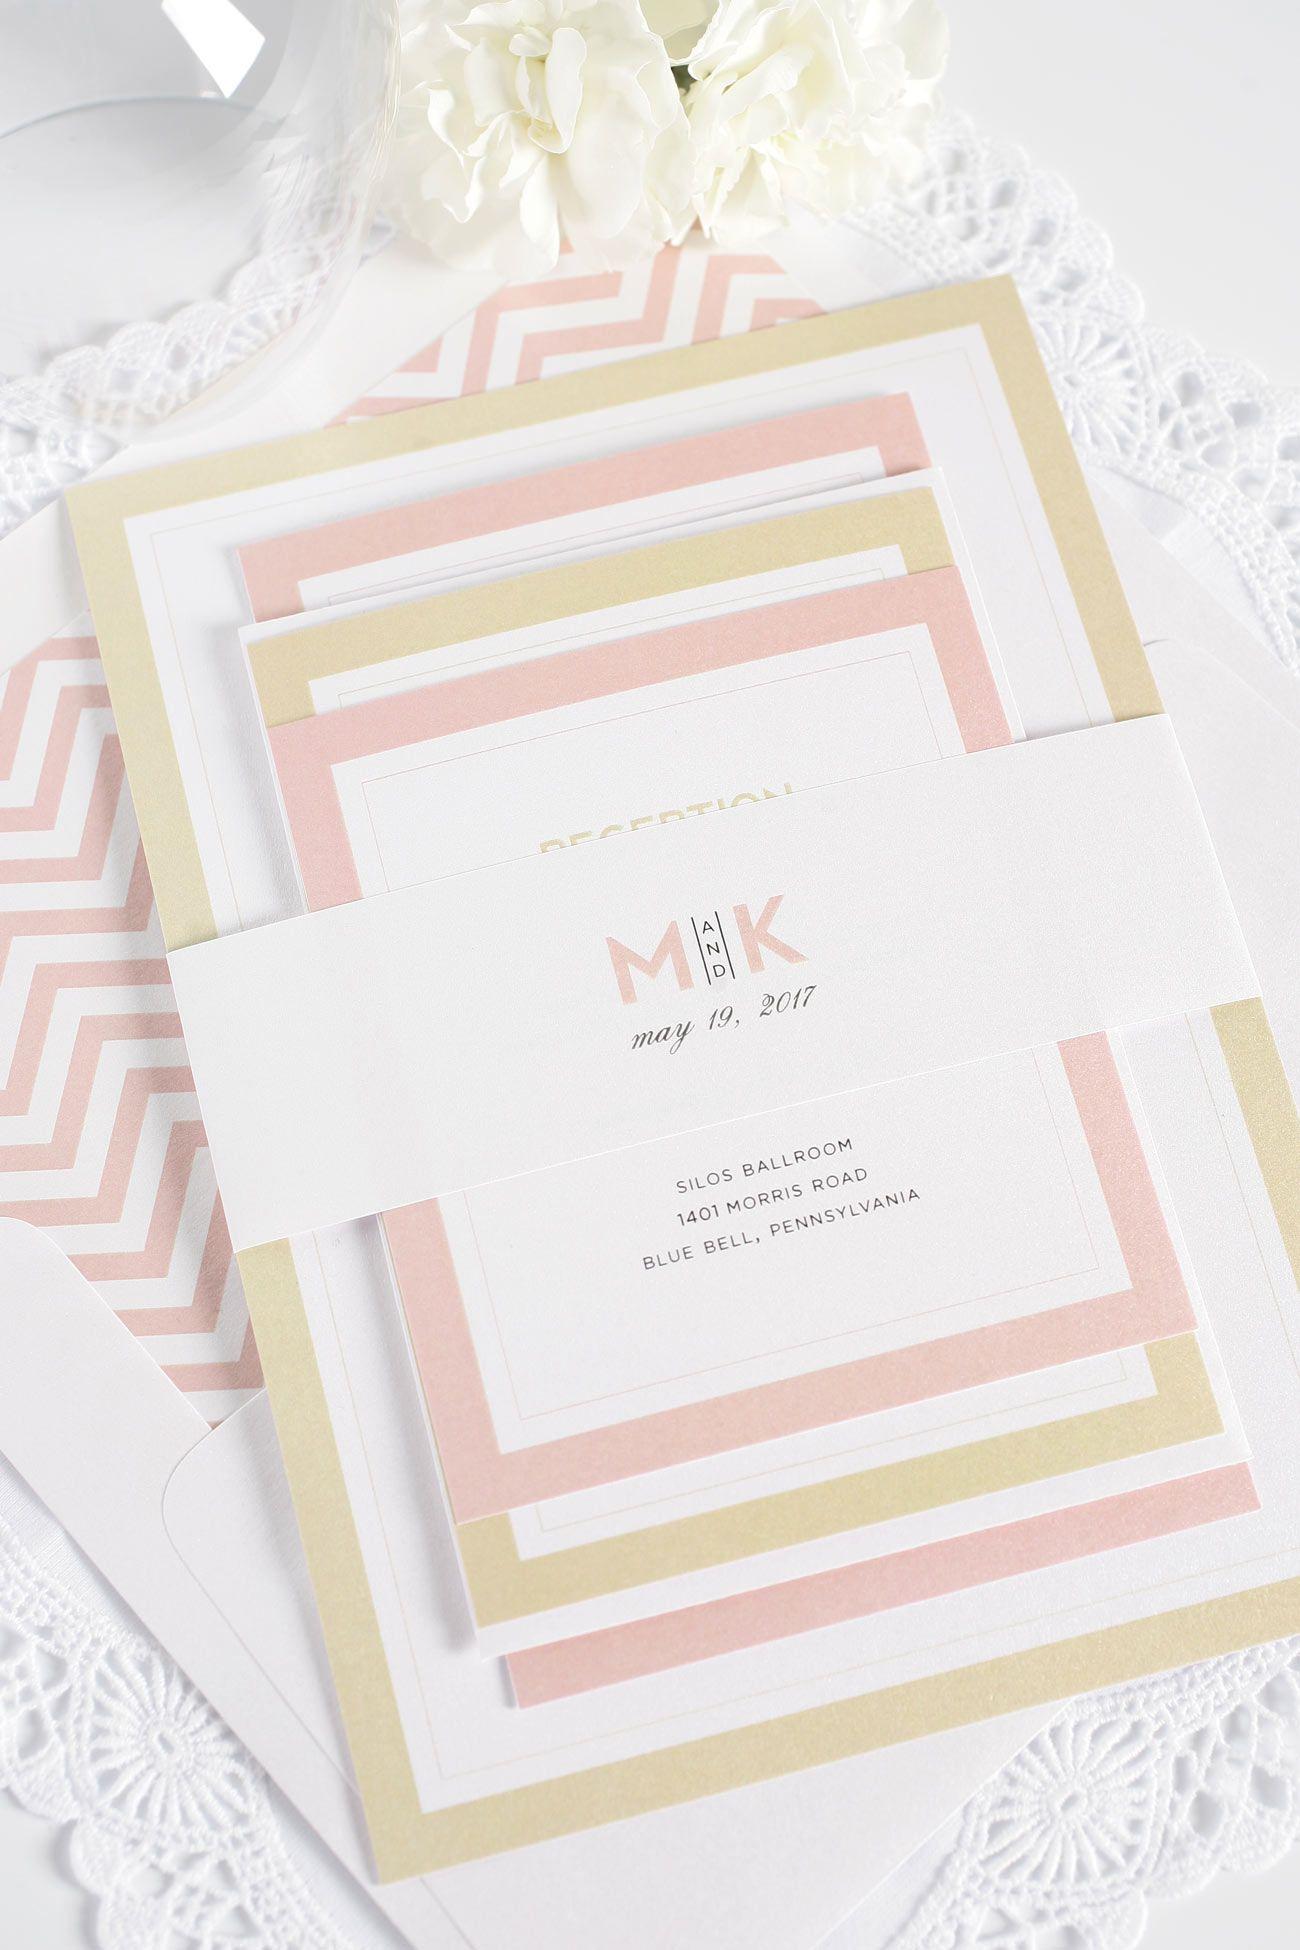 Modern Wedding Invitations in Blush and Gold | Gold weddings, Modern ...